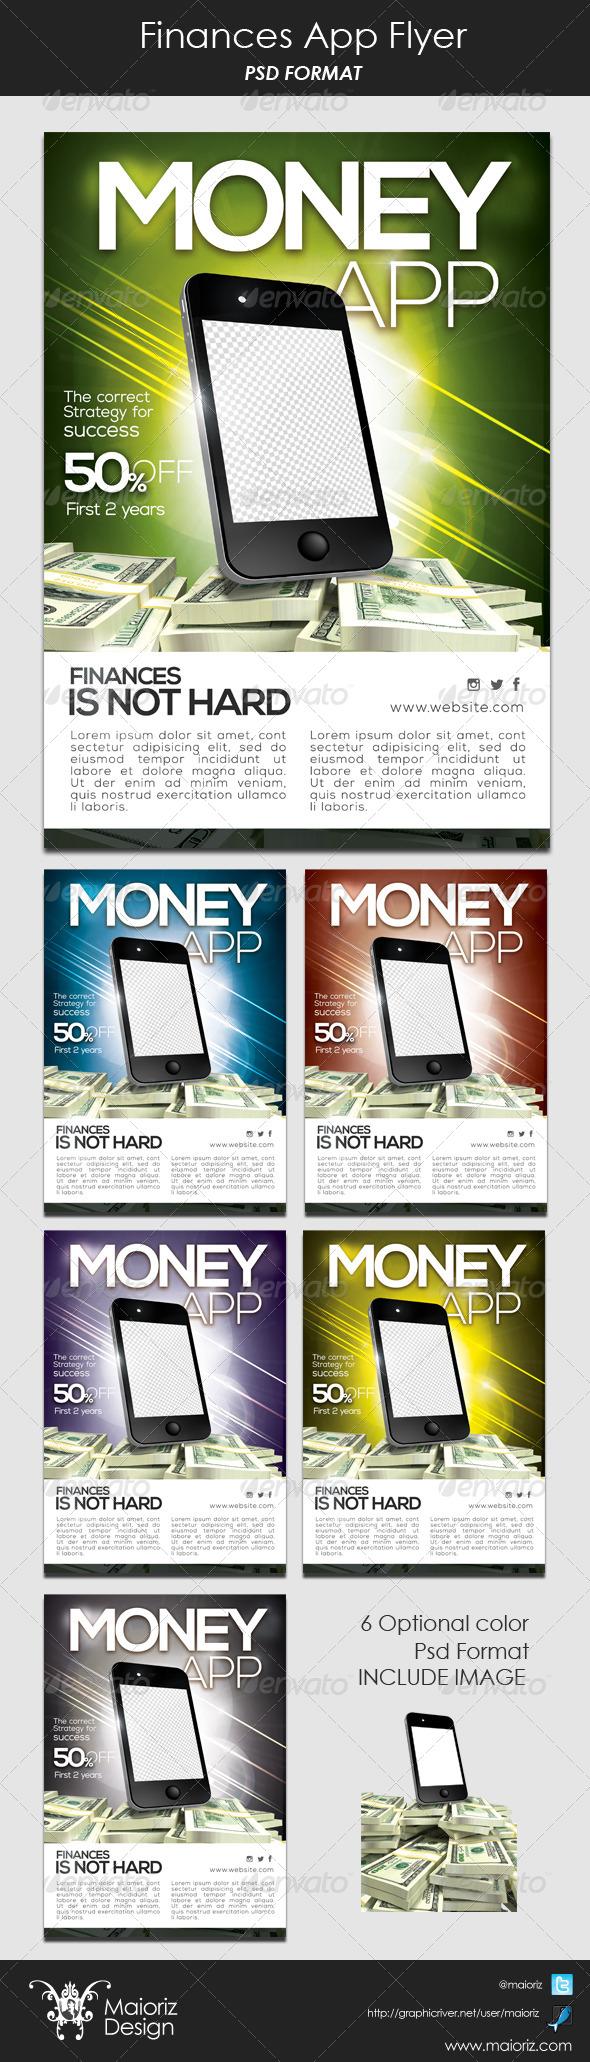 Finances App Flyer - Commerce Flyers